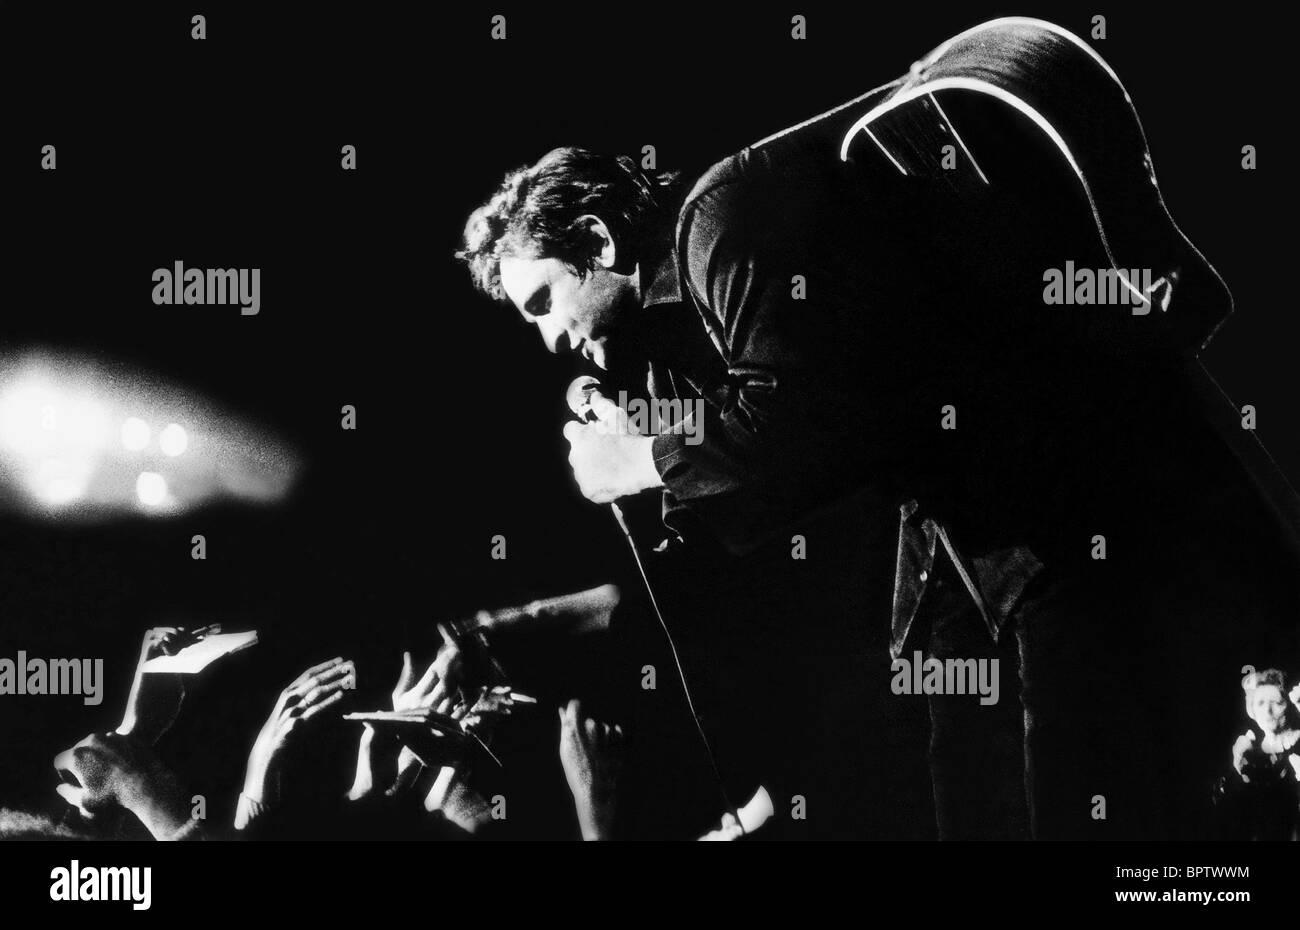 JOHNNY CASH cantante country (1972) Immagini Stock